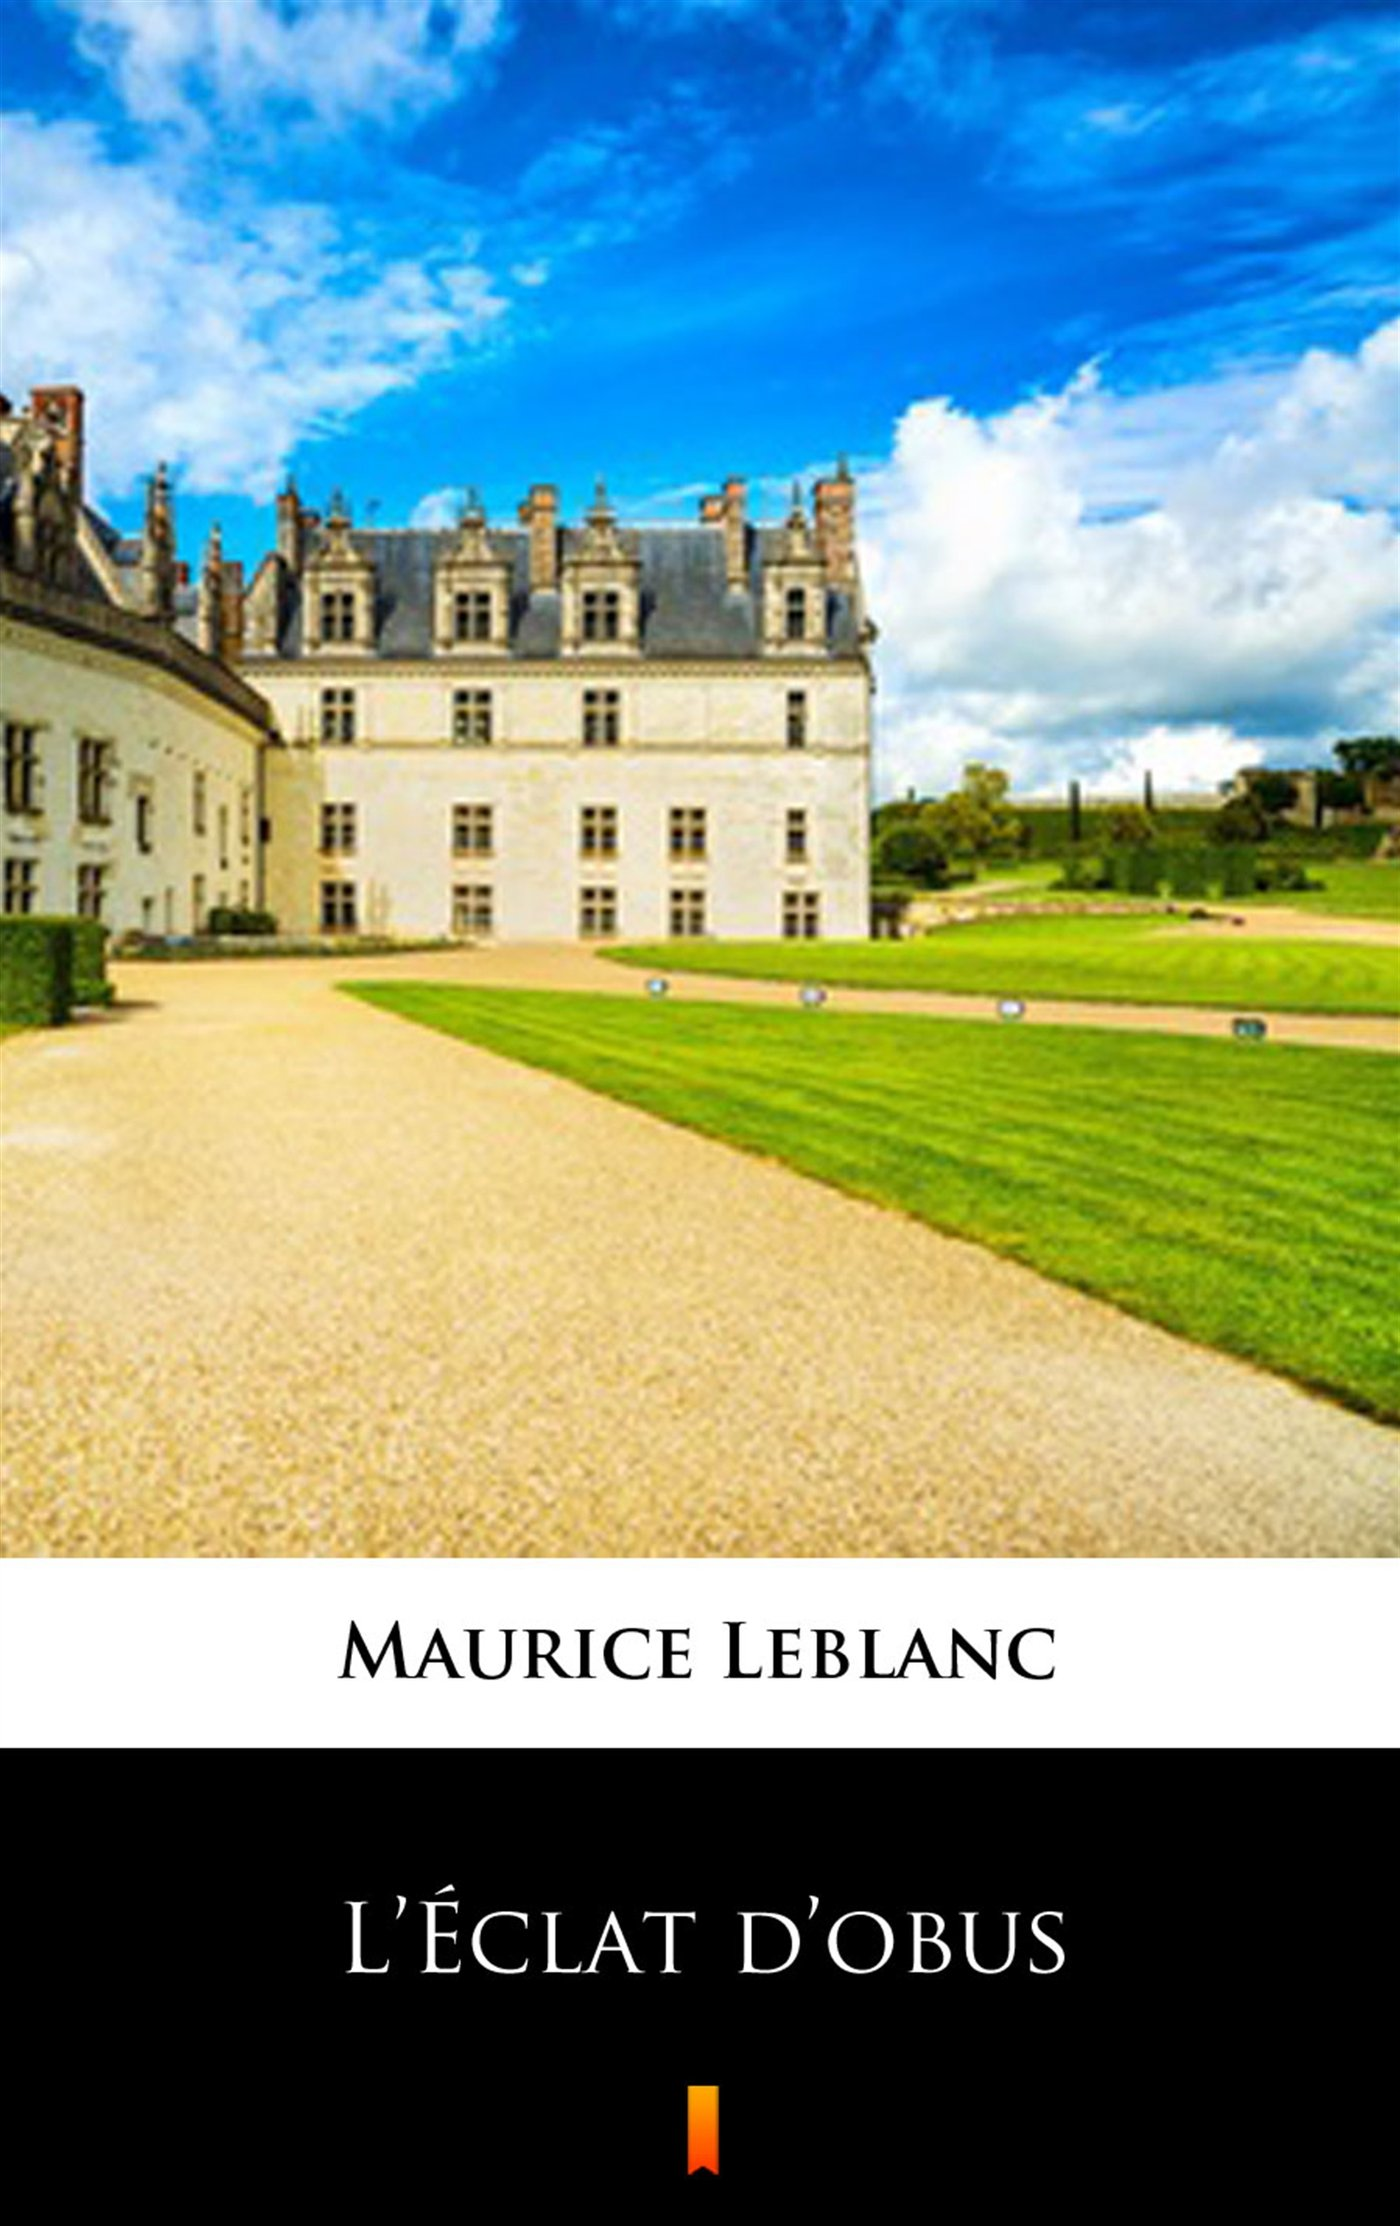 L Eclat d obus - Ebook (Książka na Kindle) do pobrania w formacie MOBI